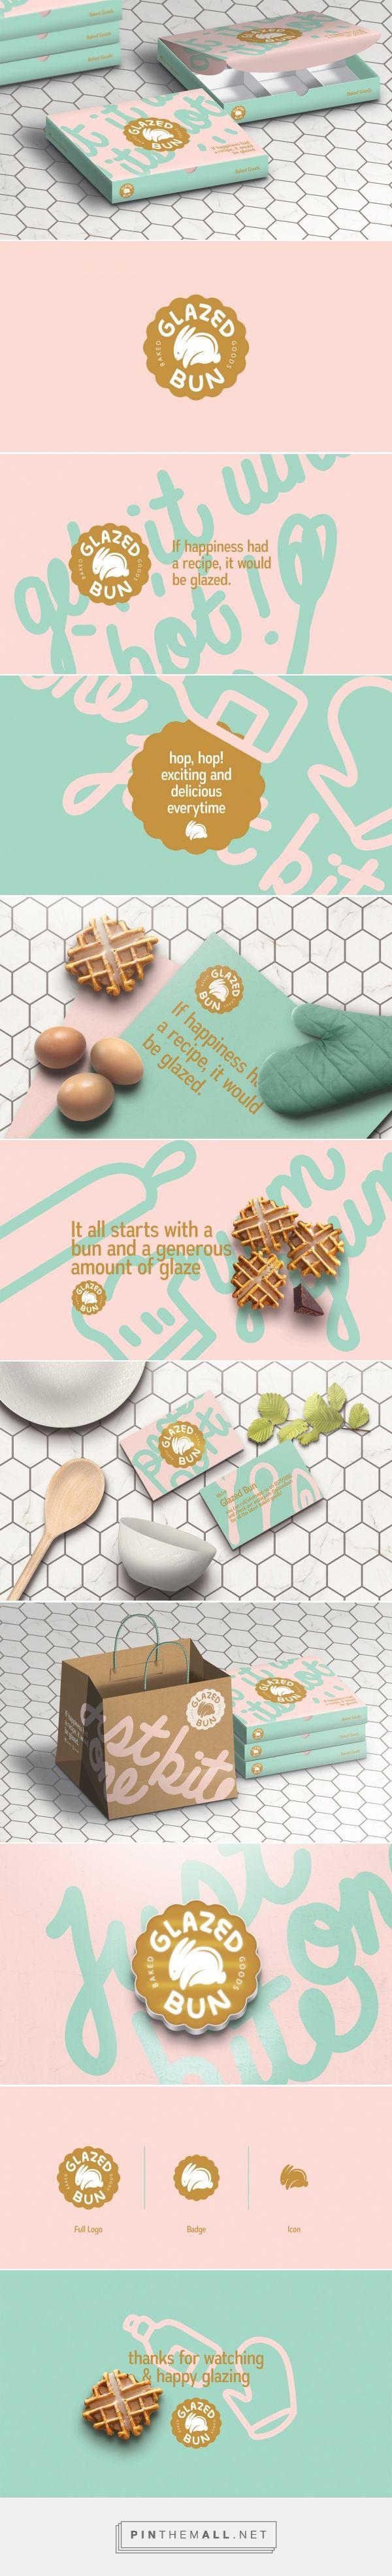 Glazed Bun Branding by Studio AIO on Behance | Fivestar Branding – Design and Branding Agency & Inspiration Gallery